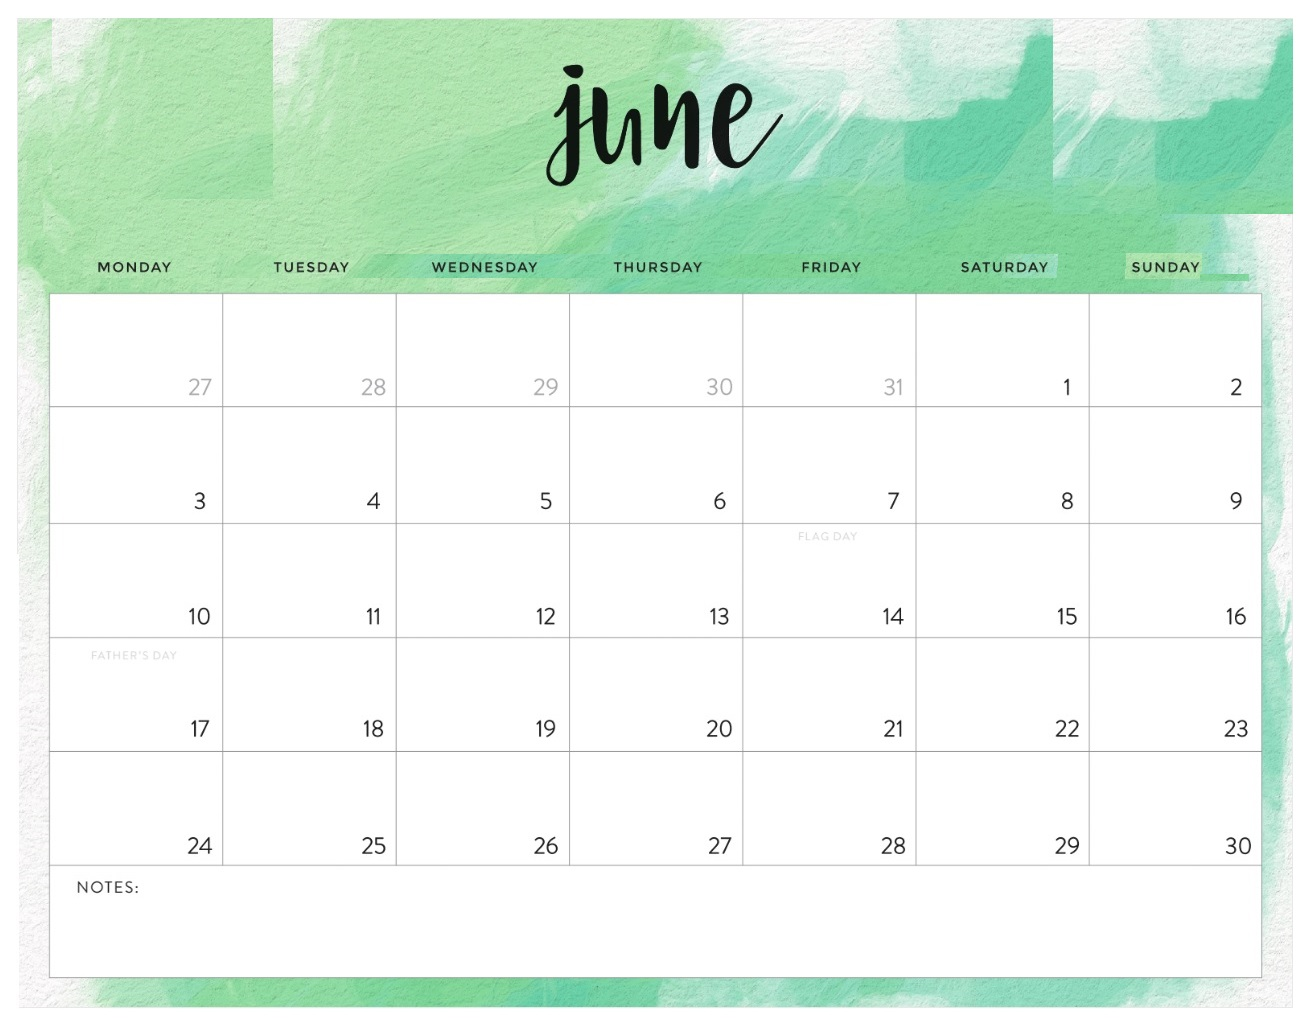 Free June 2019 Editable Calendar